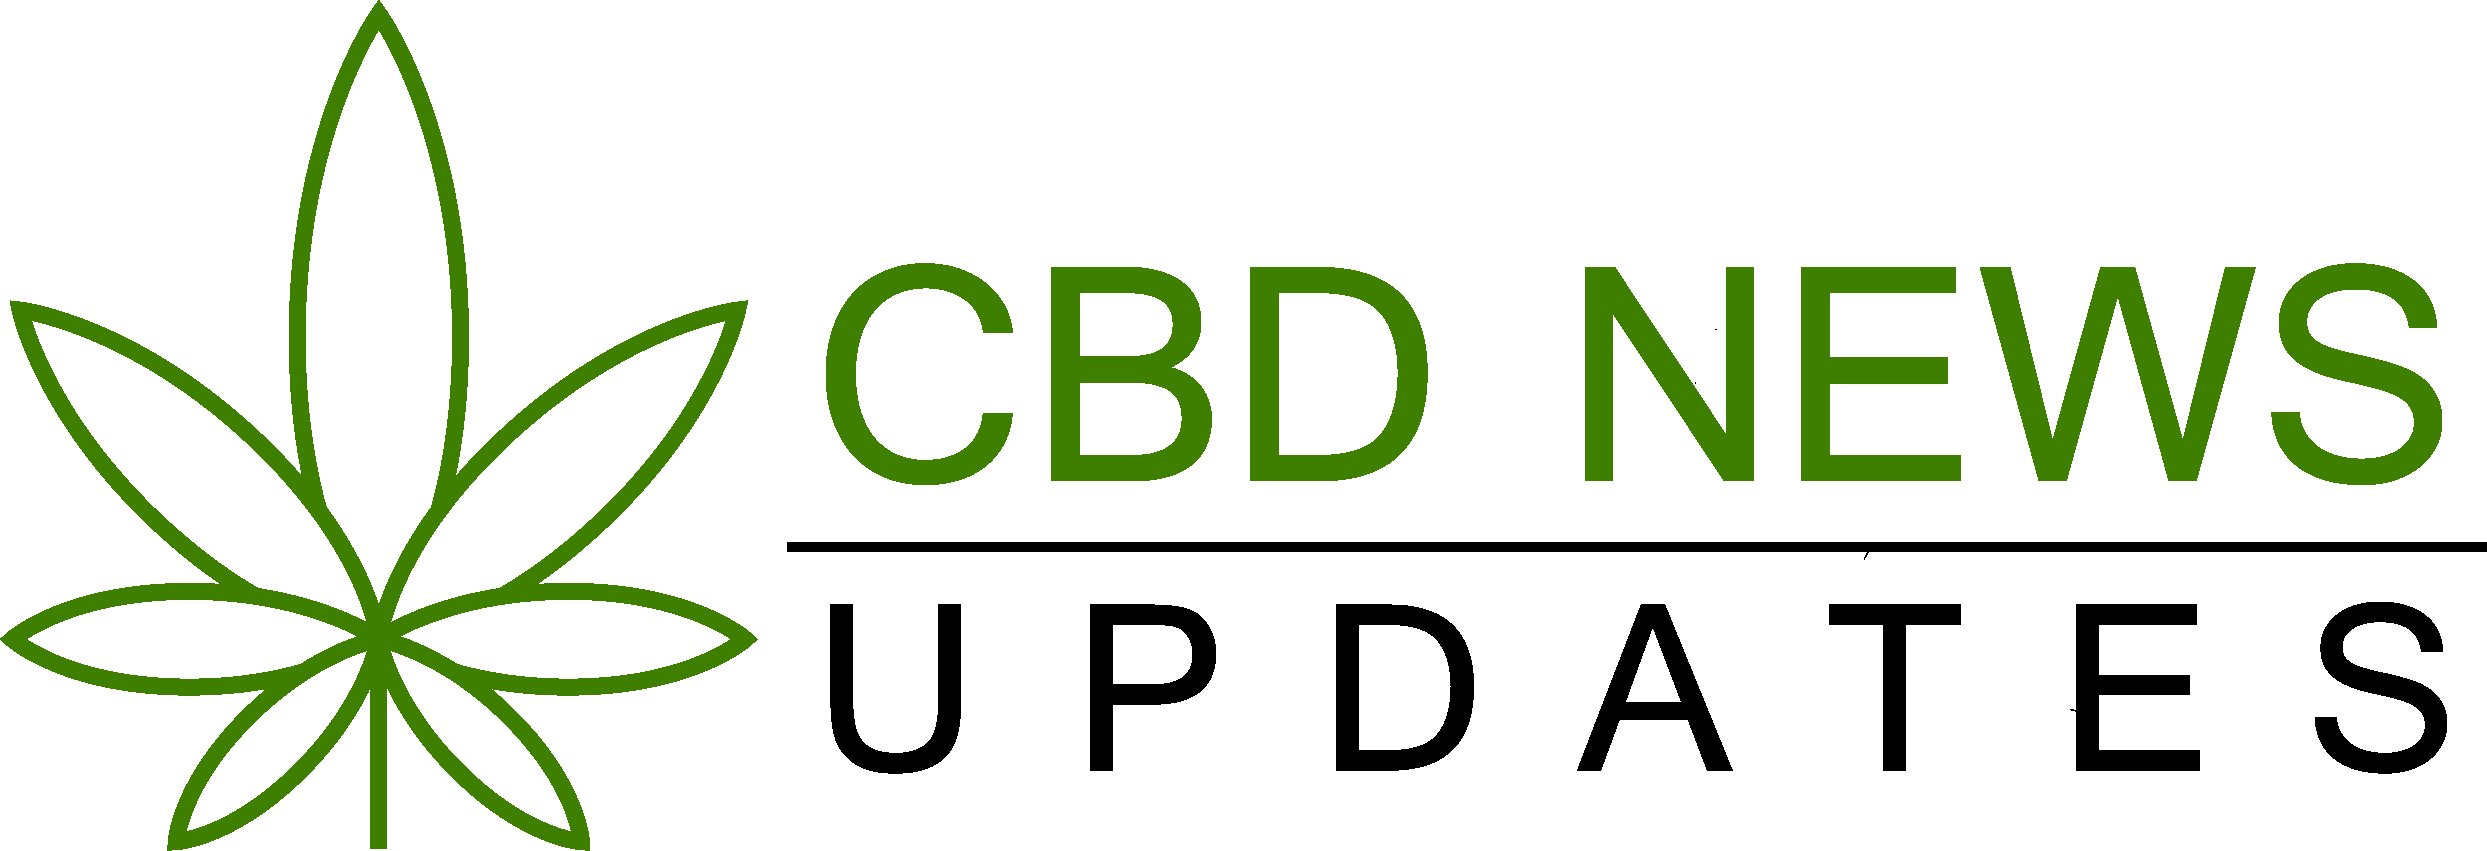 CBD News Update